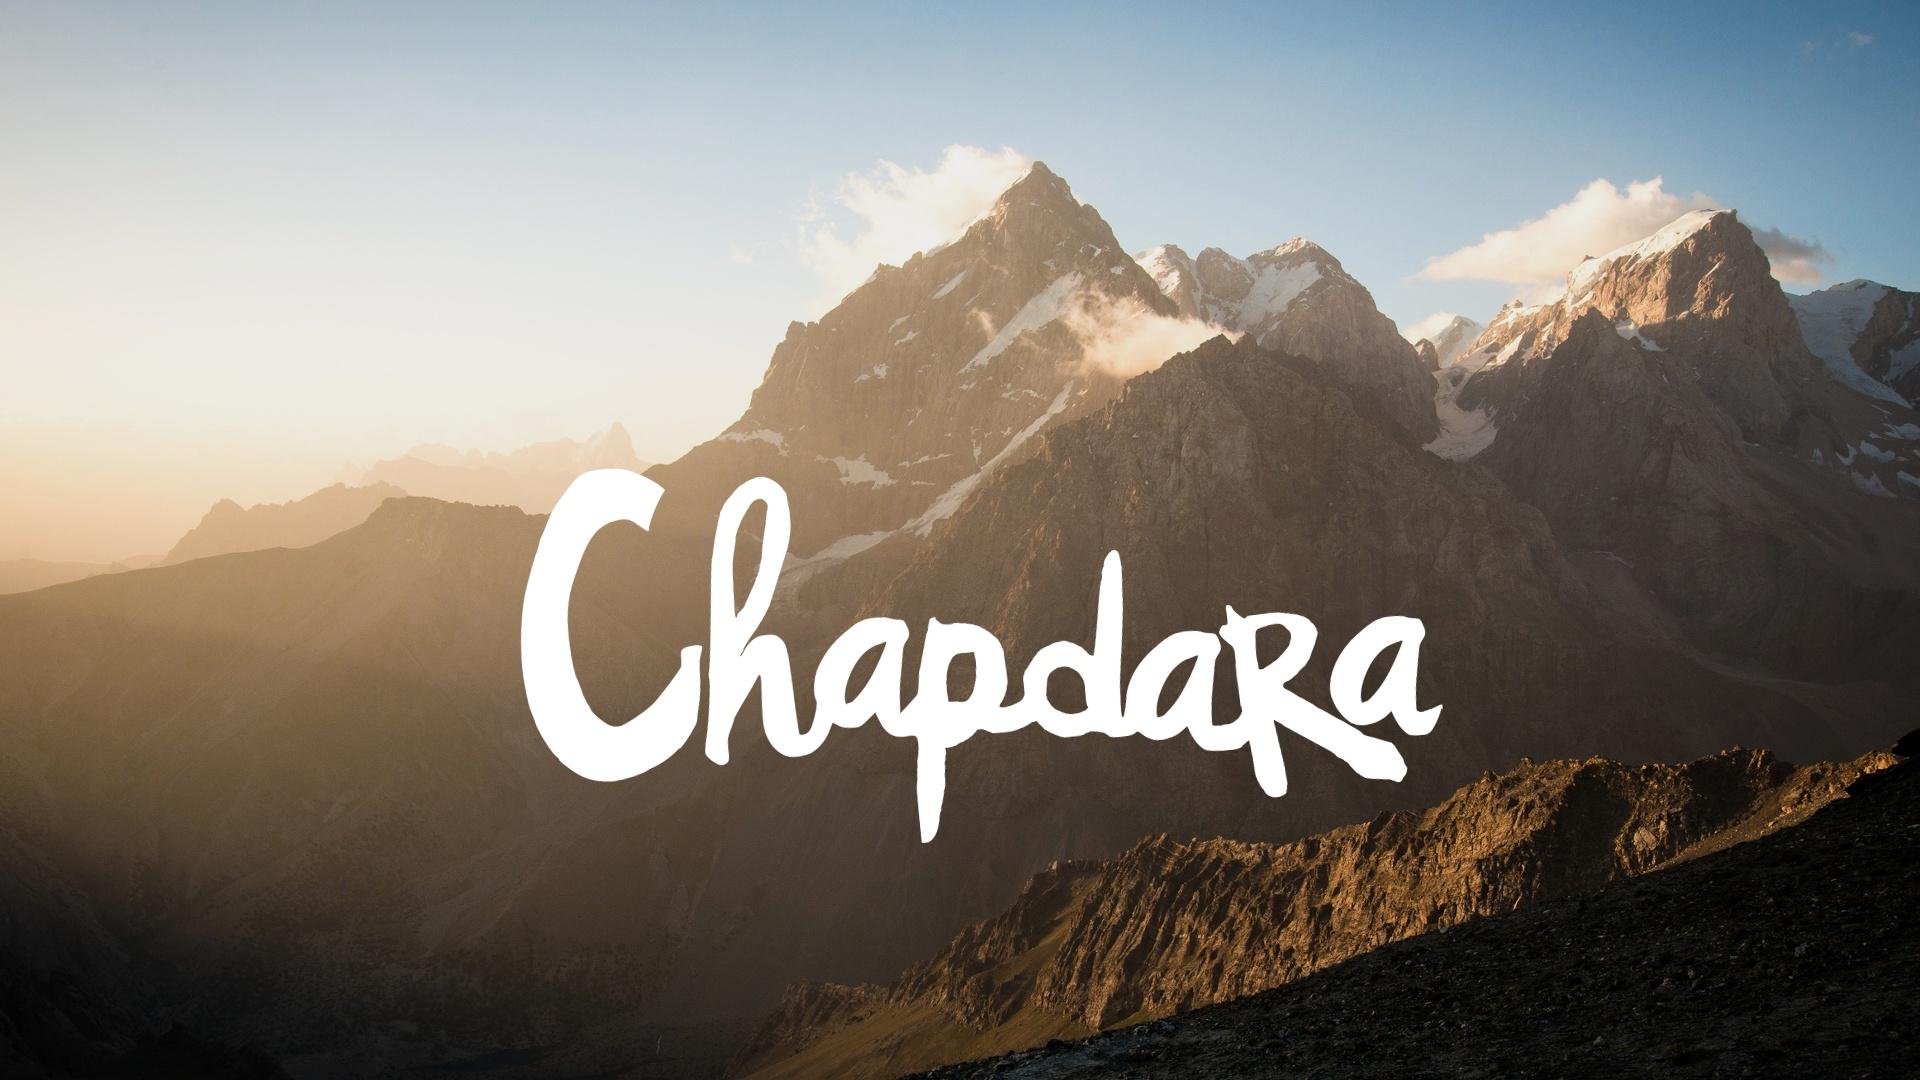 Chapdara 2018